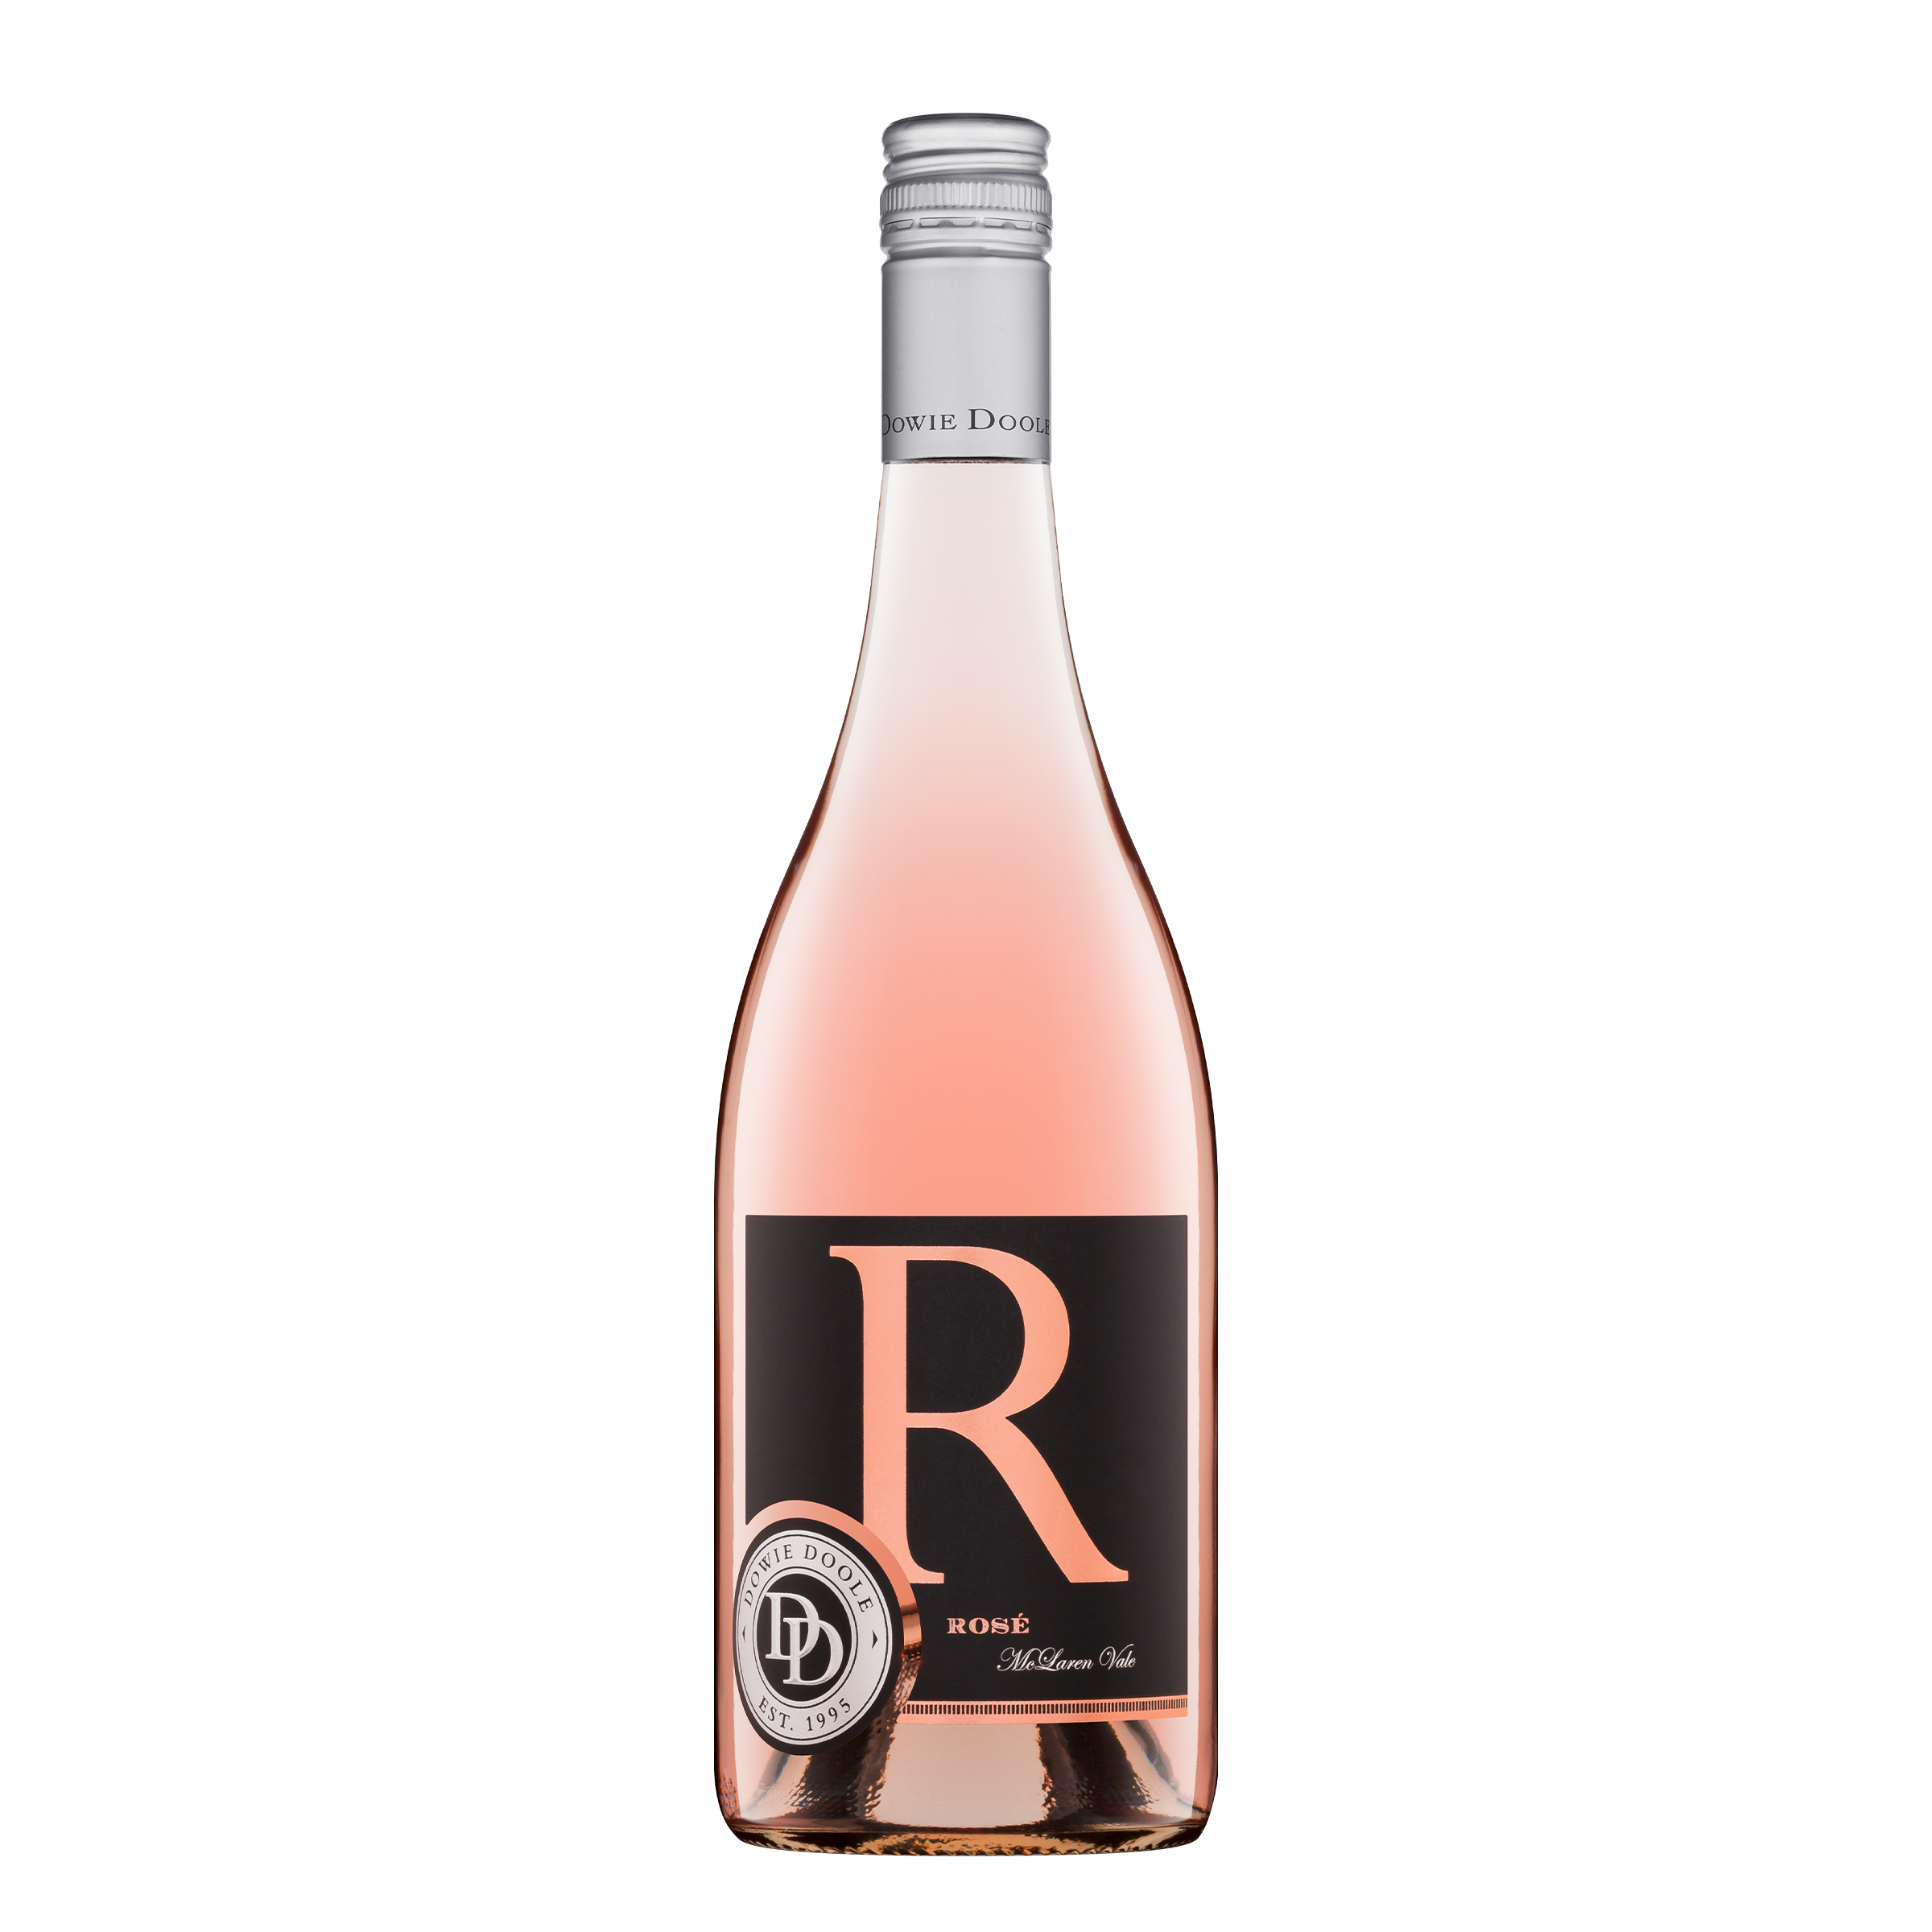 Dowie Doole Alternative Grenache & Vermentino Rosé